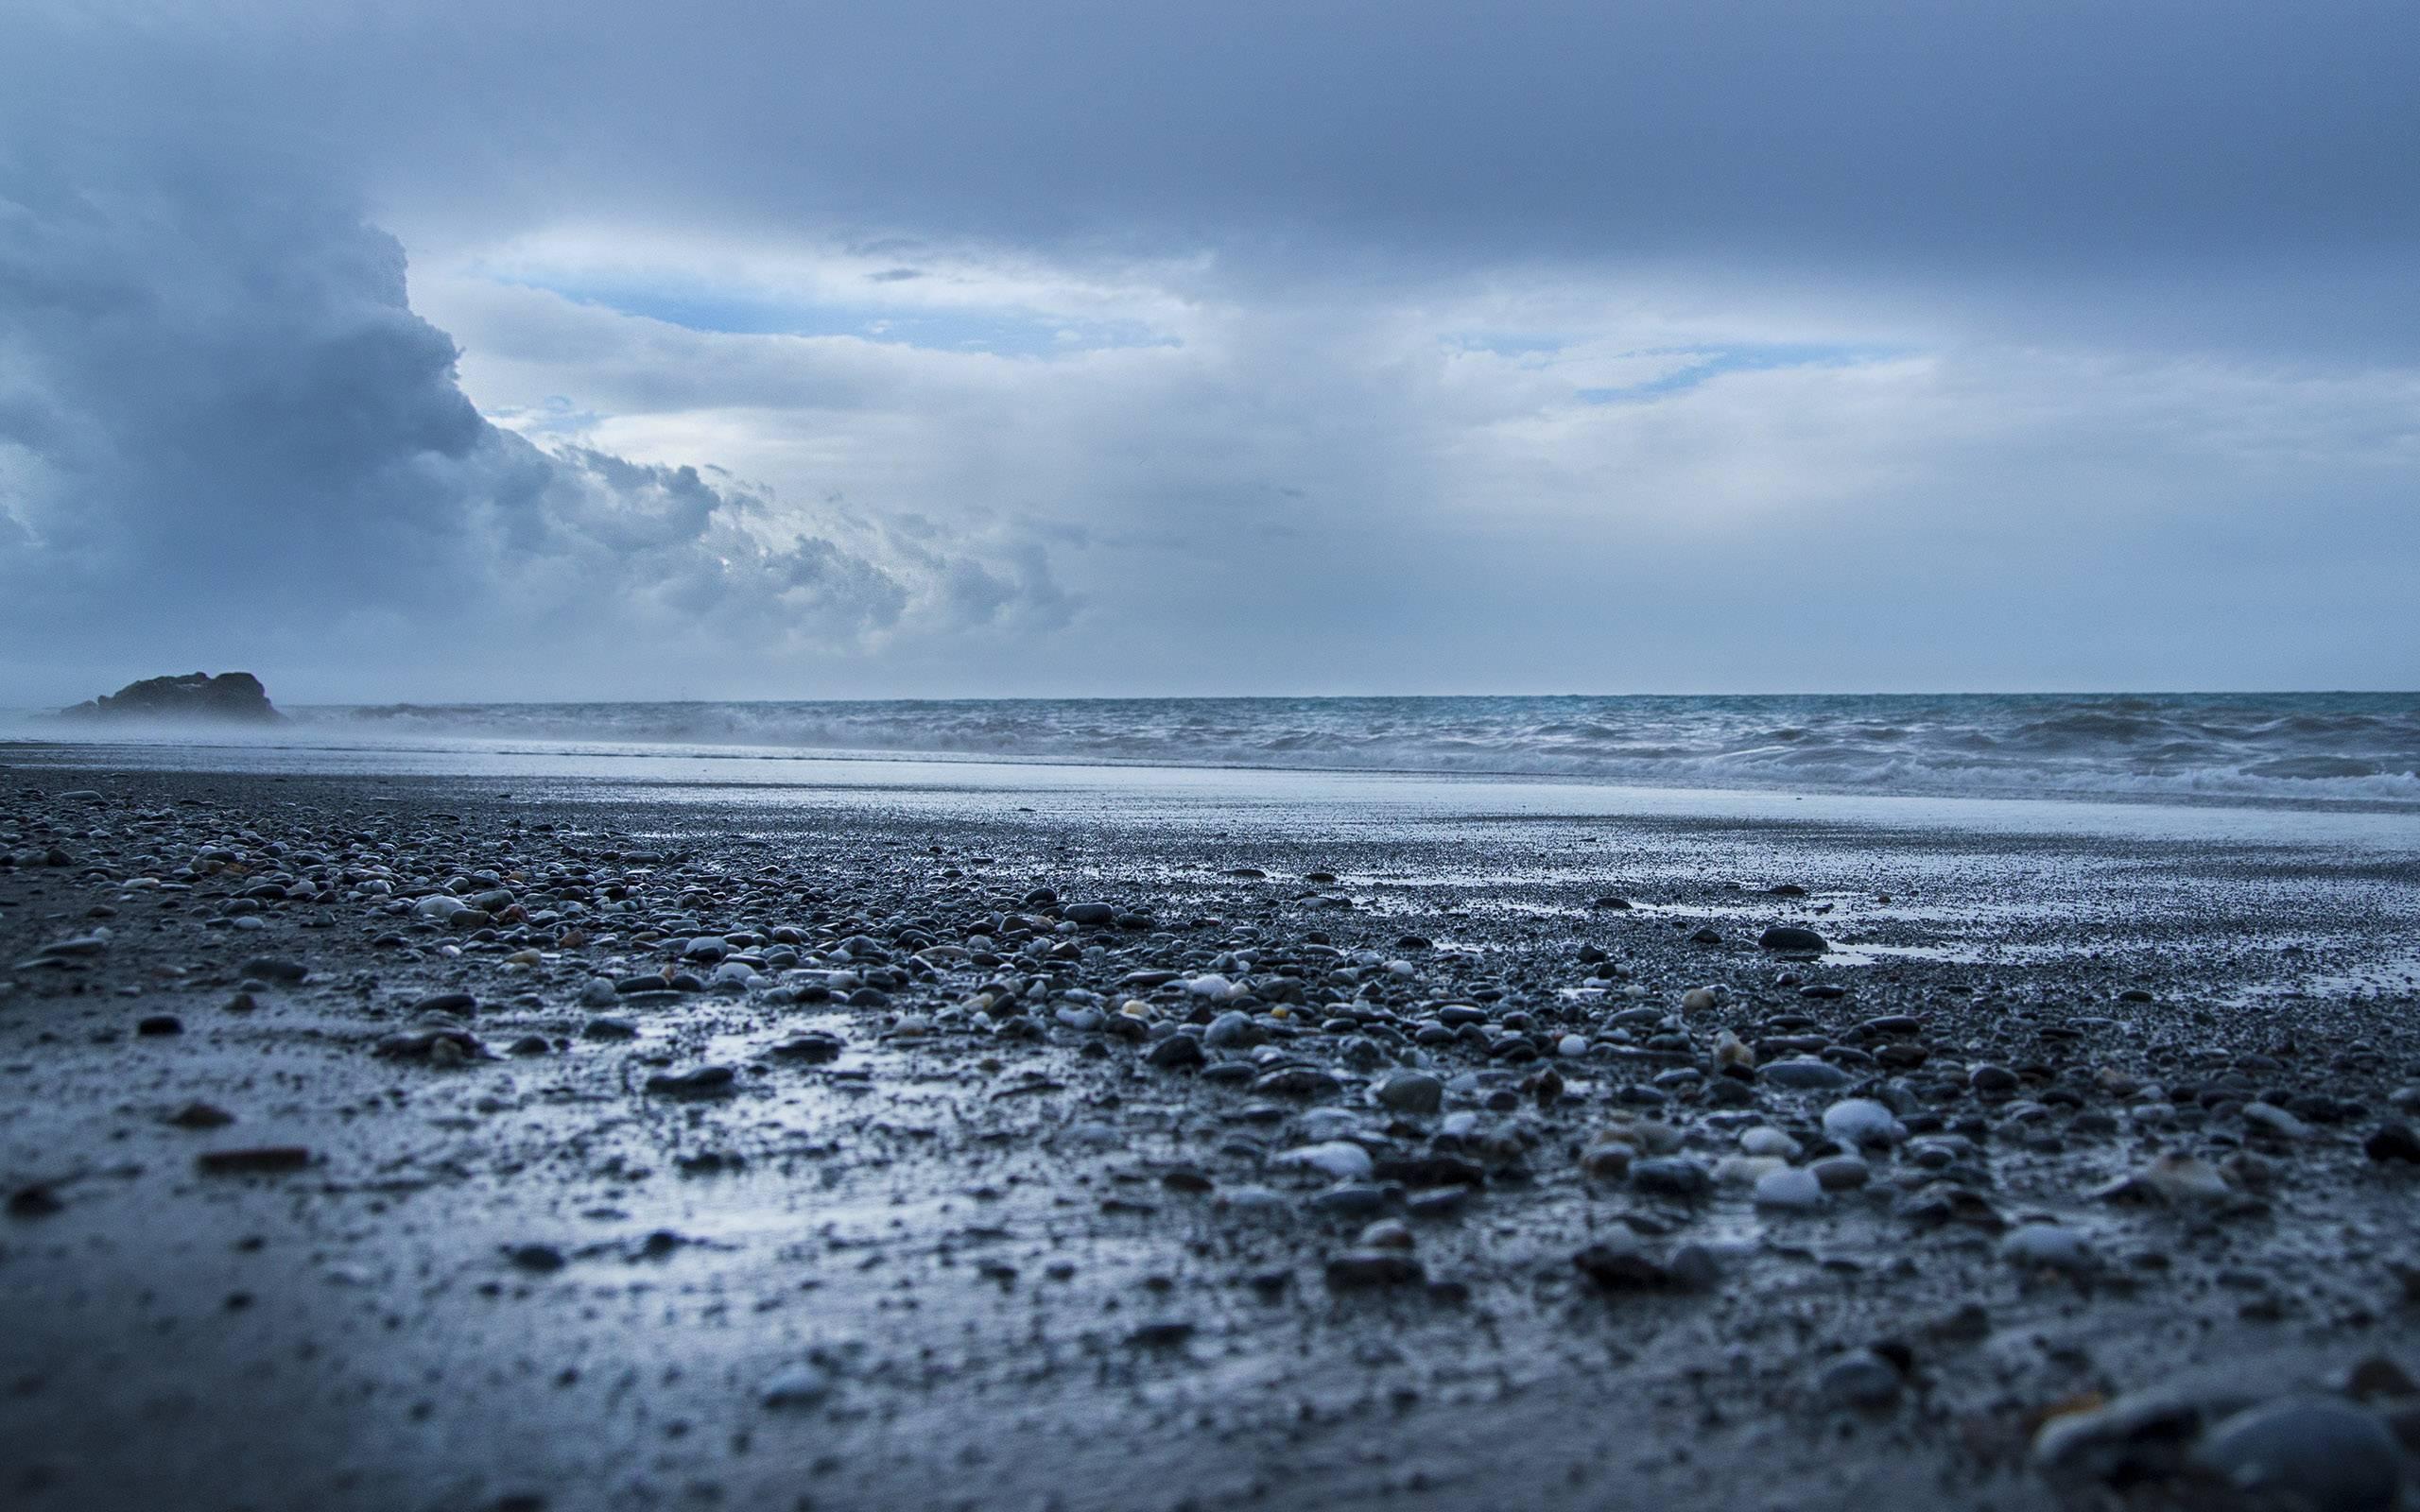 La plage par Renato Giordanelli